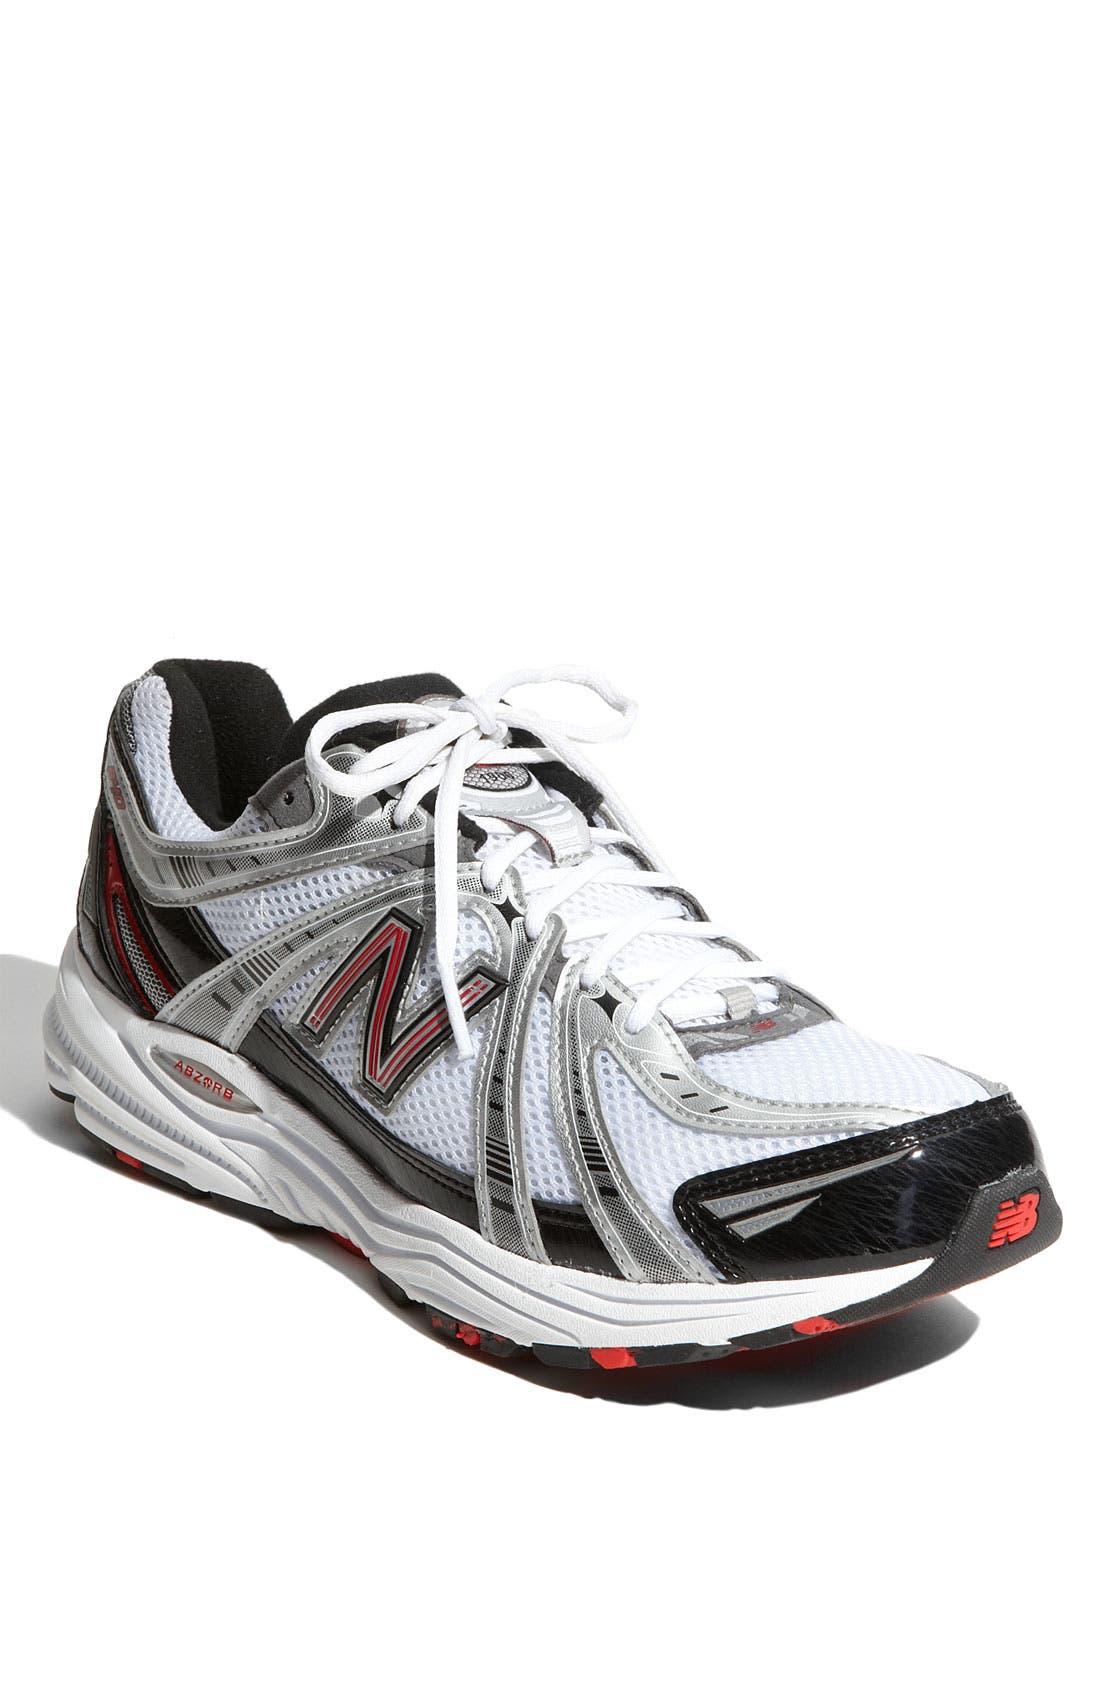 Alternate Image 1 Selected - New Balance '840' Running Shoe (Men) (Online Only)